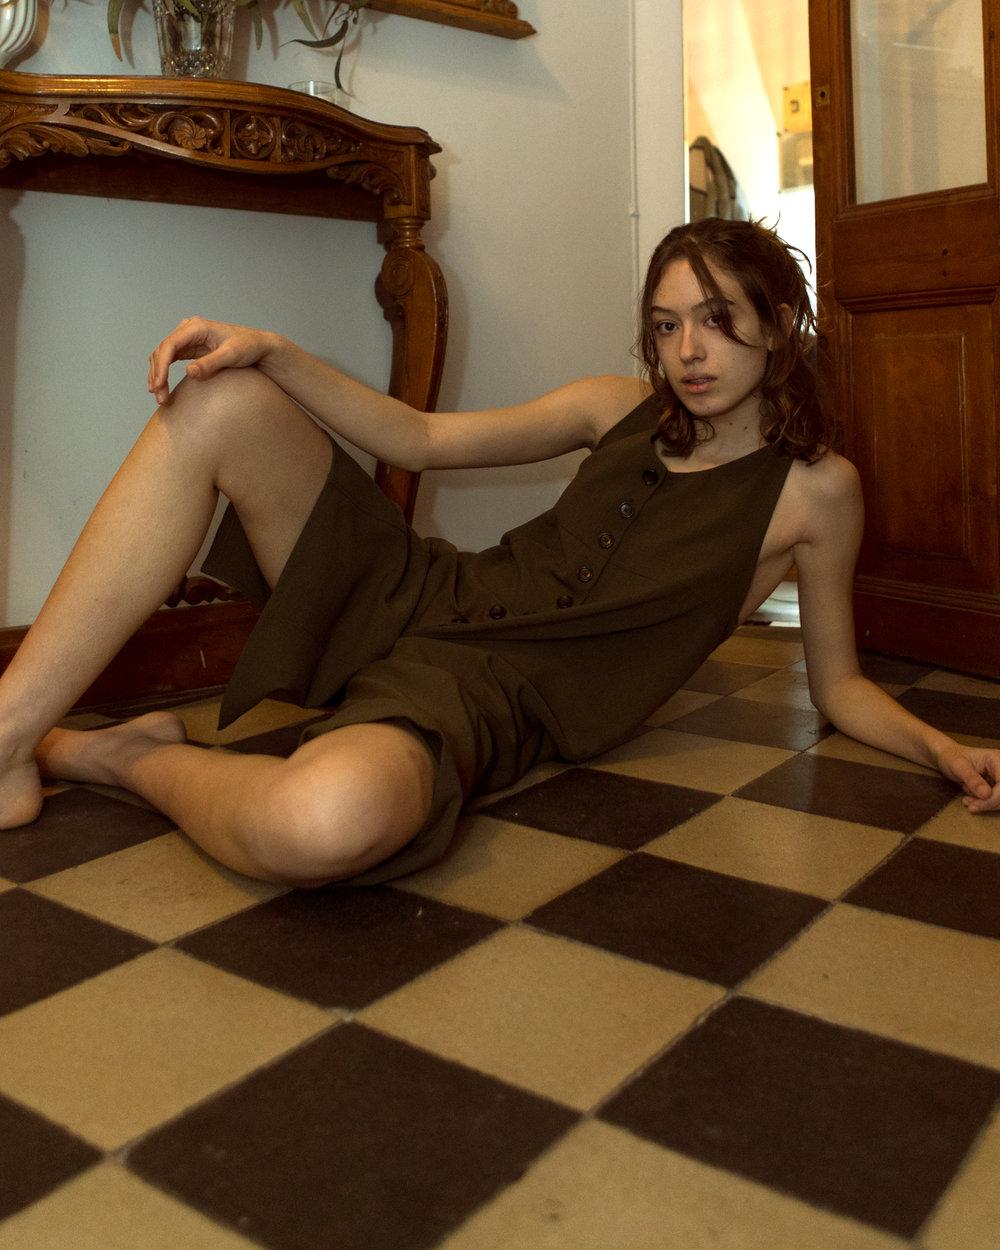 Irene by Juan Achiaga